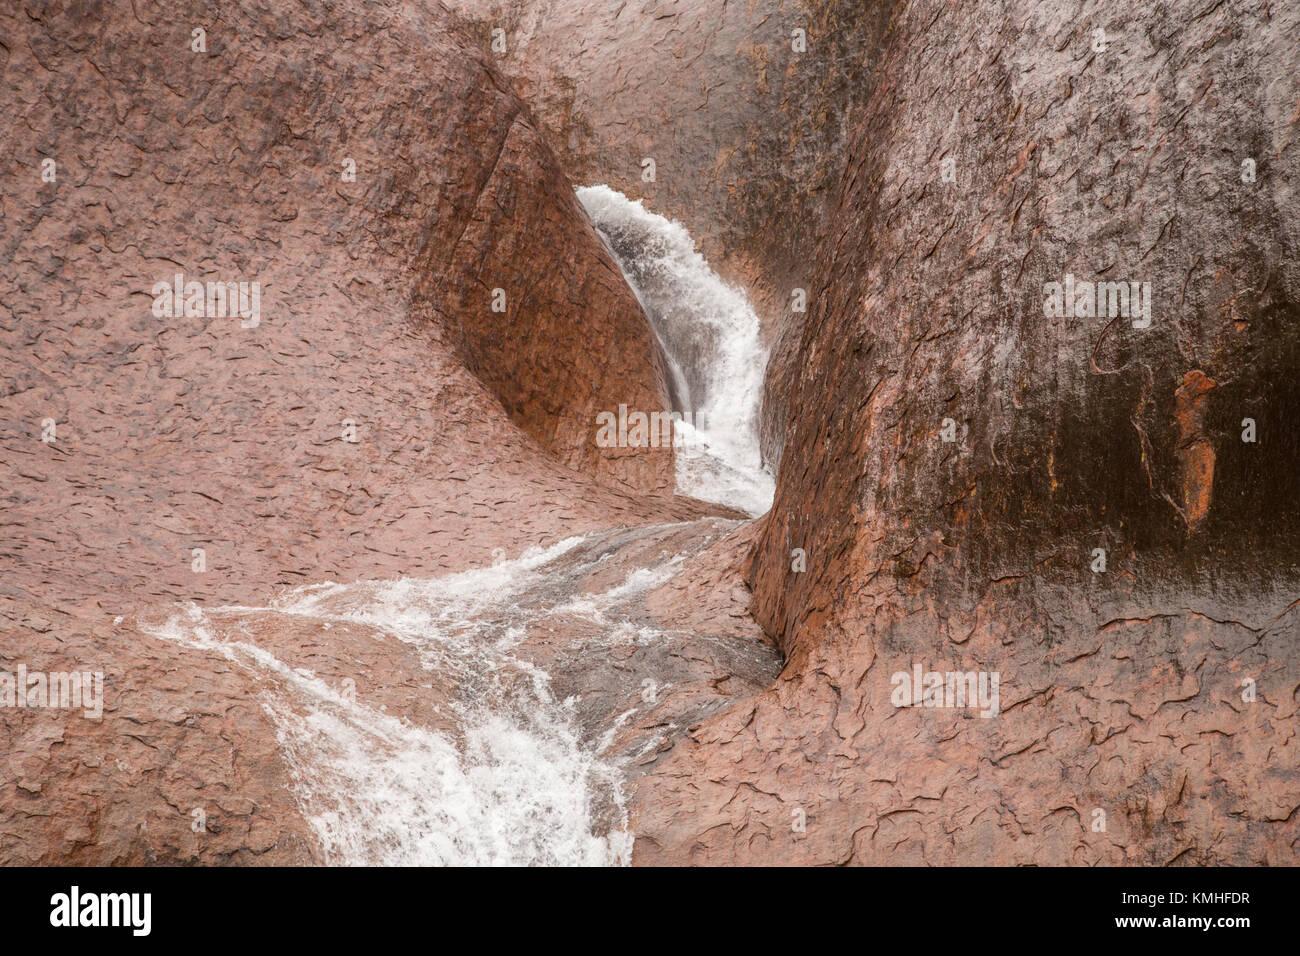 Ayers Rock in the rain - waterfalls on Uluru during a rare rainstorm in Uluru Kata Tjuta National Park, Northern - Stock Image